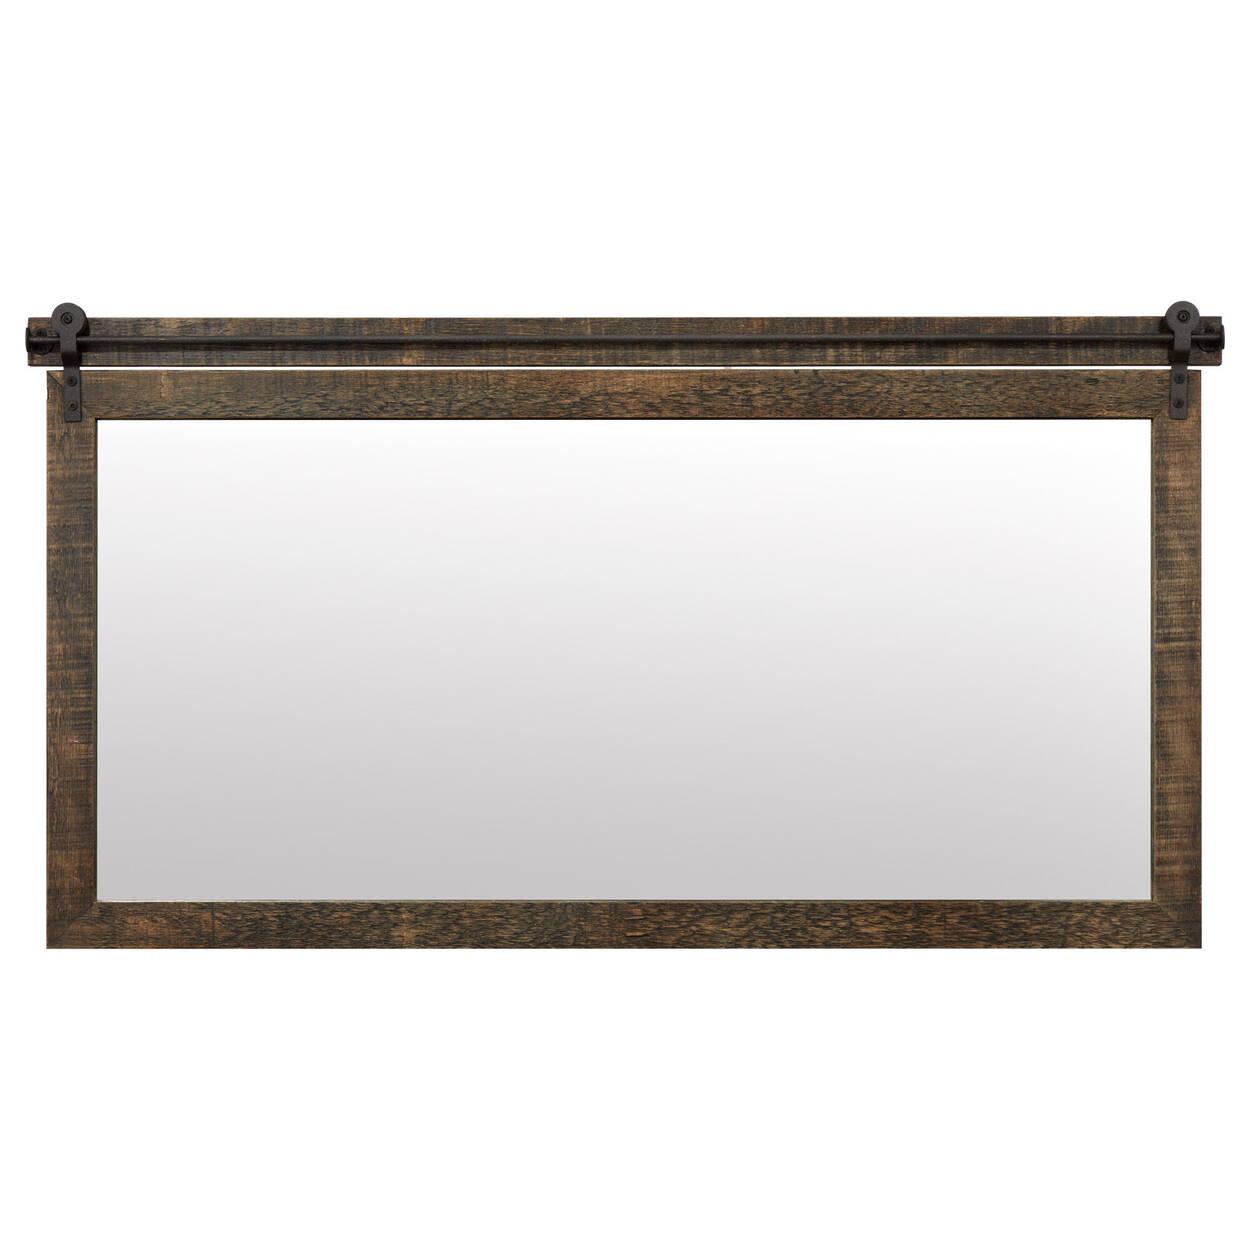 Barn Wood Inspired Mirror